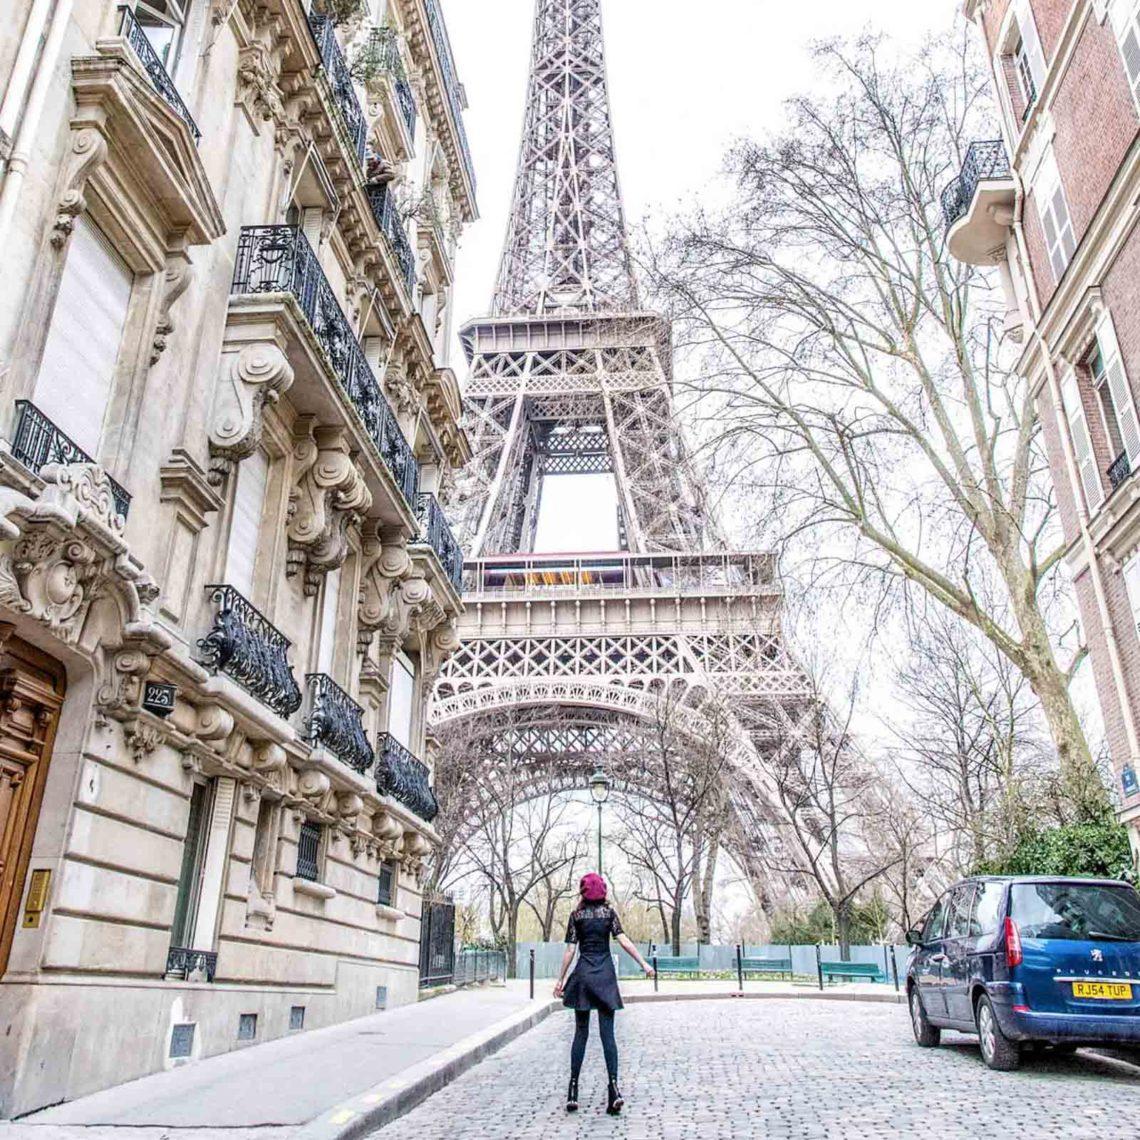 Woman standing in front of Eiffel Tower on Rue de l'Université in Paris.